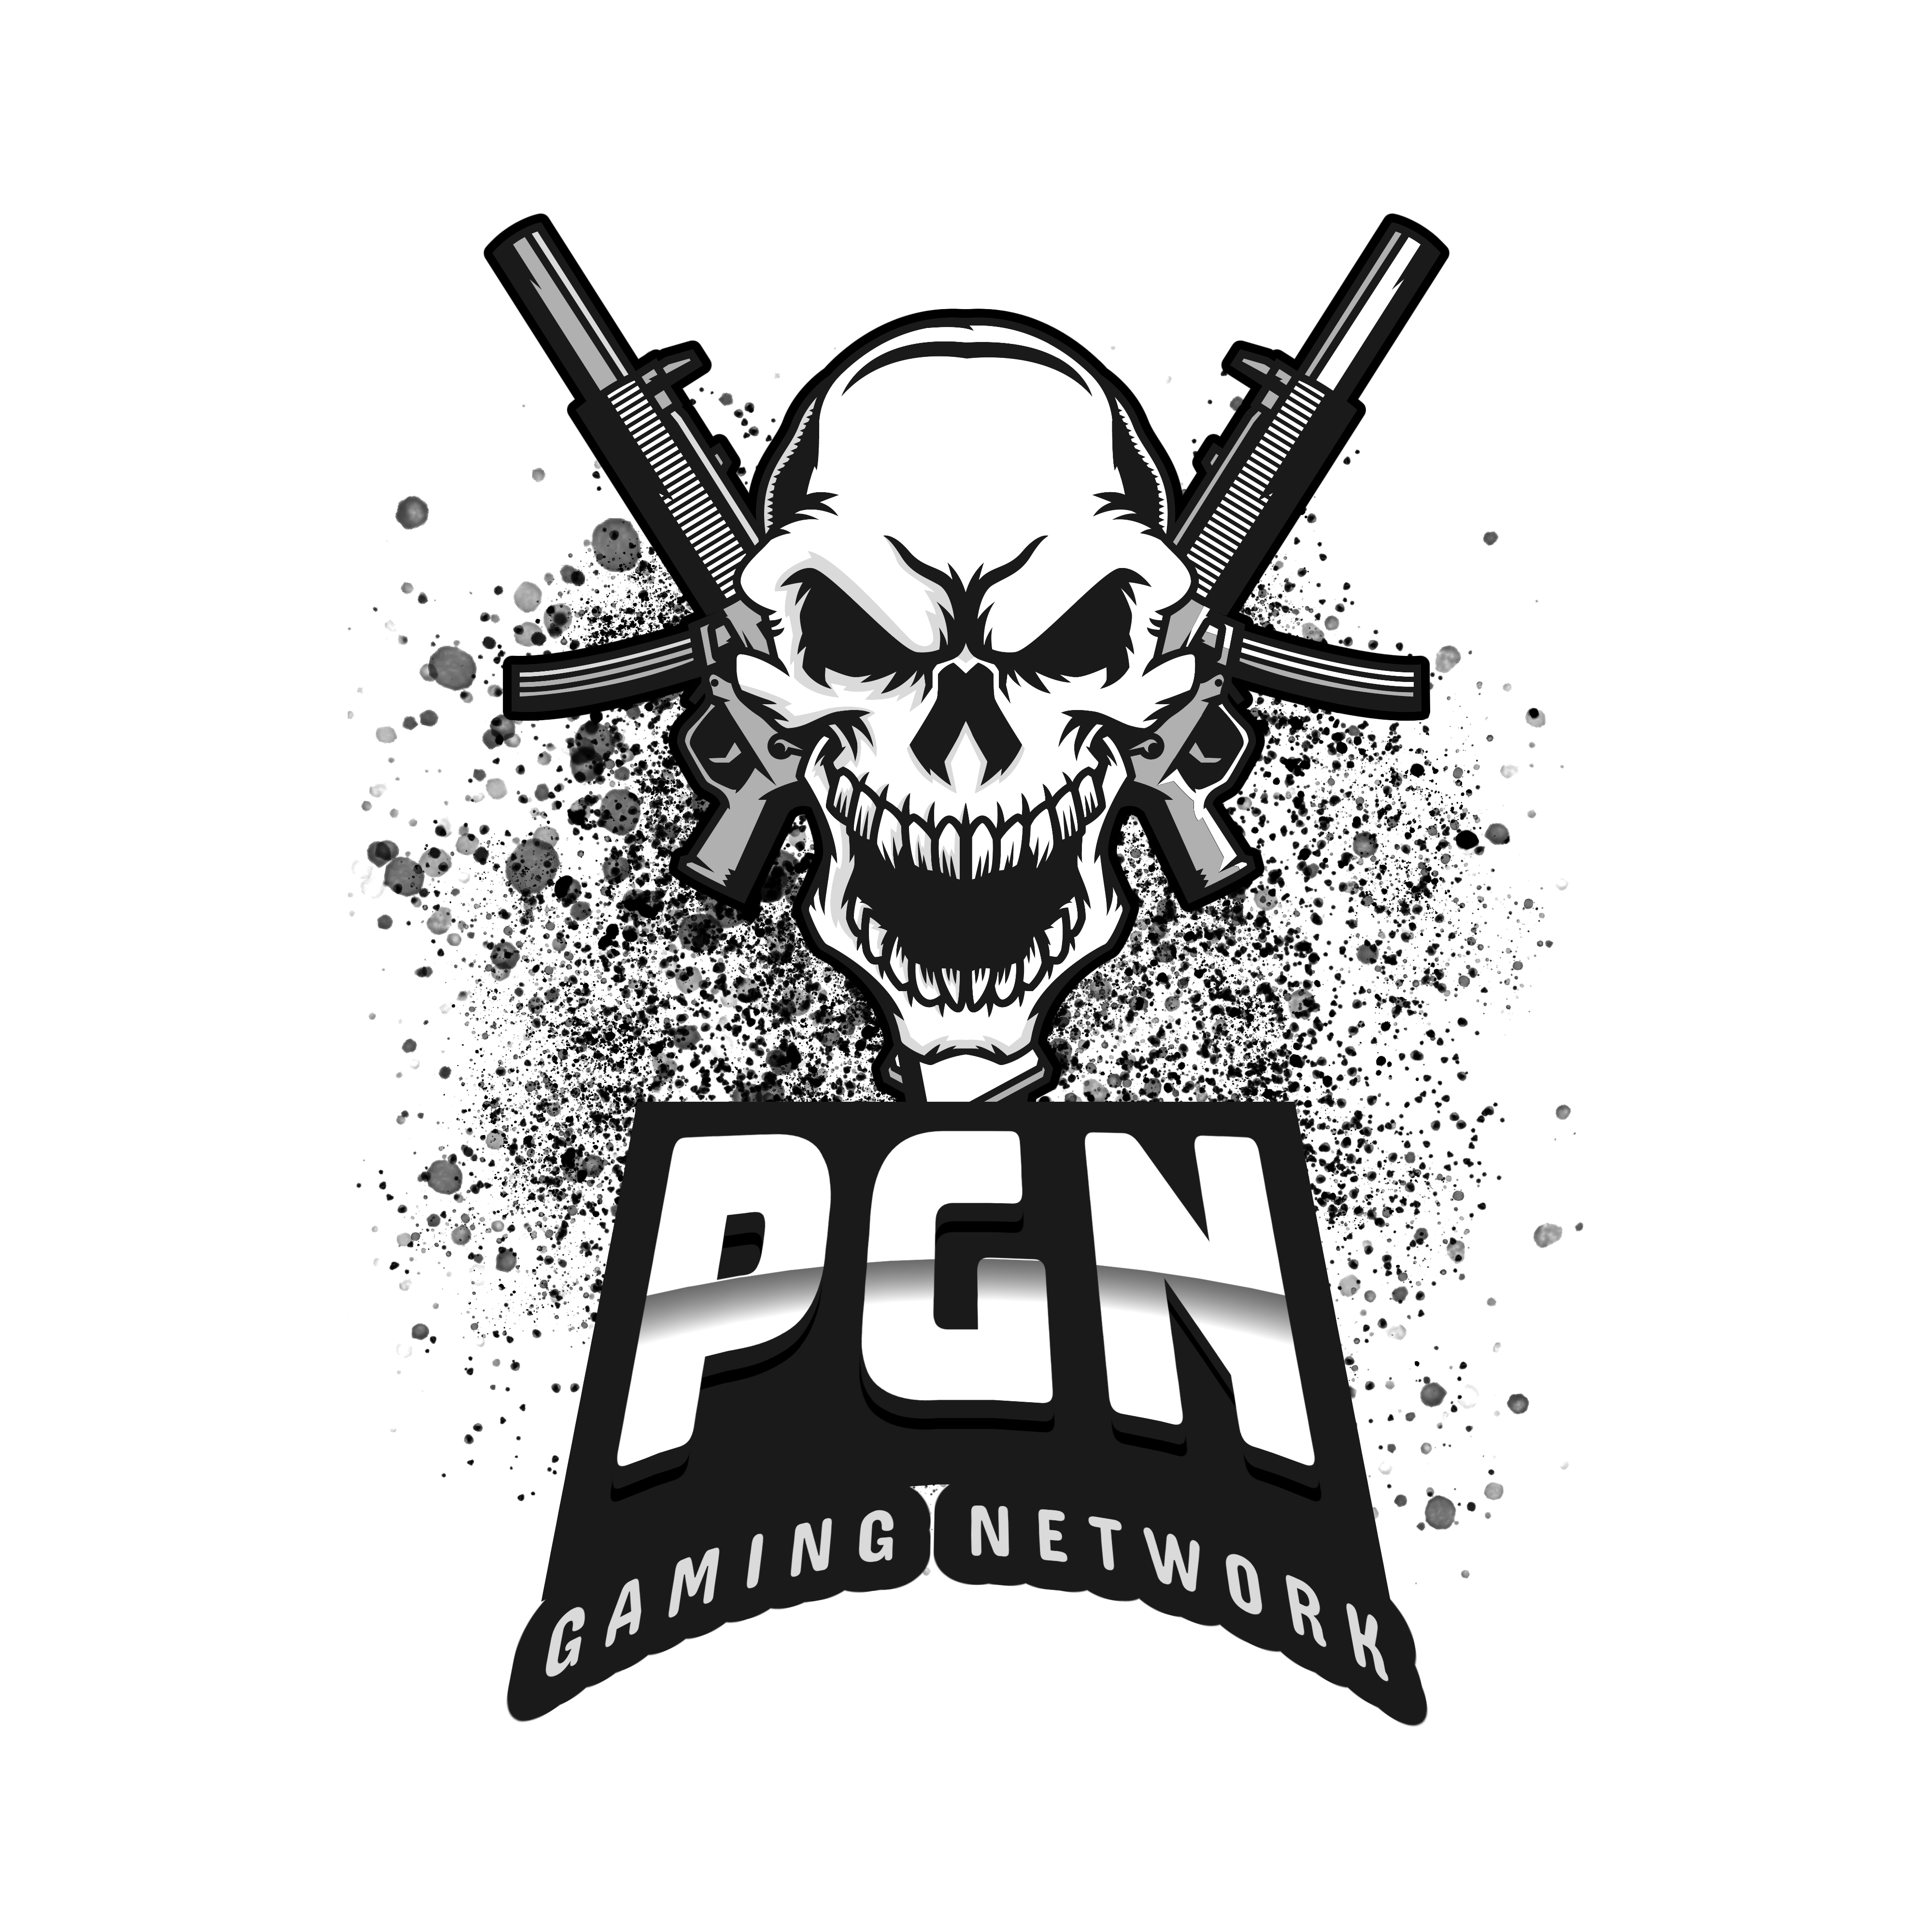 Prestige Gaming Network